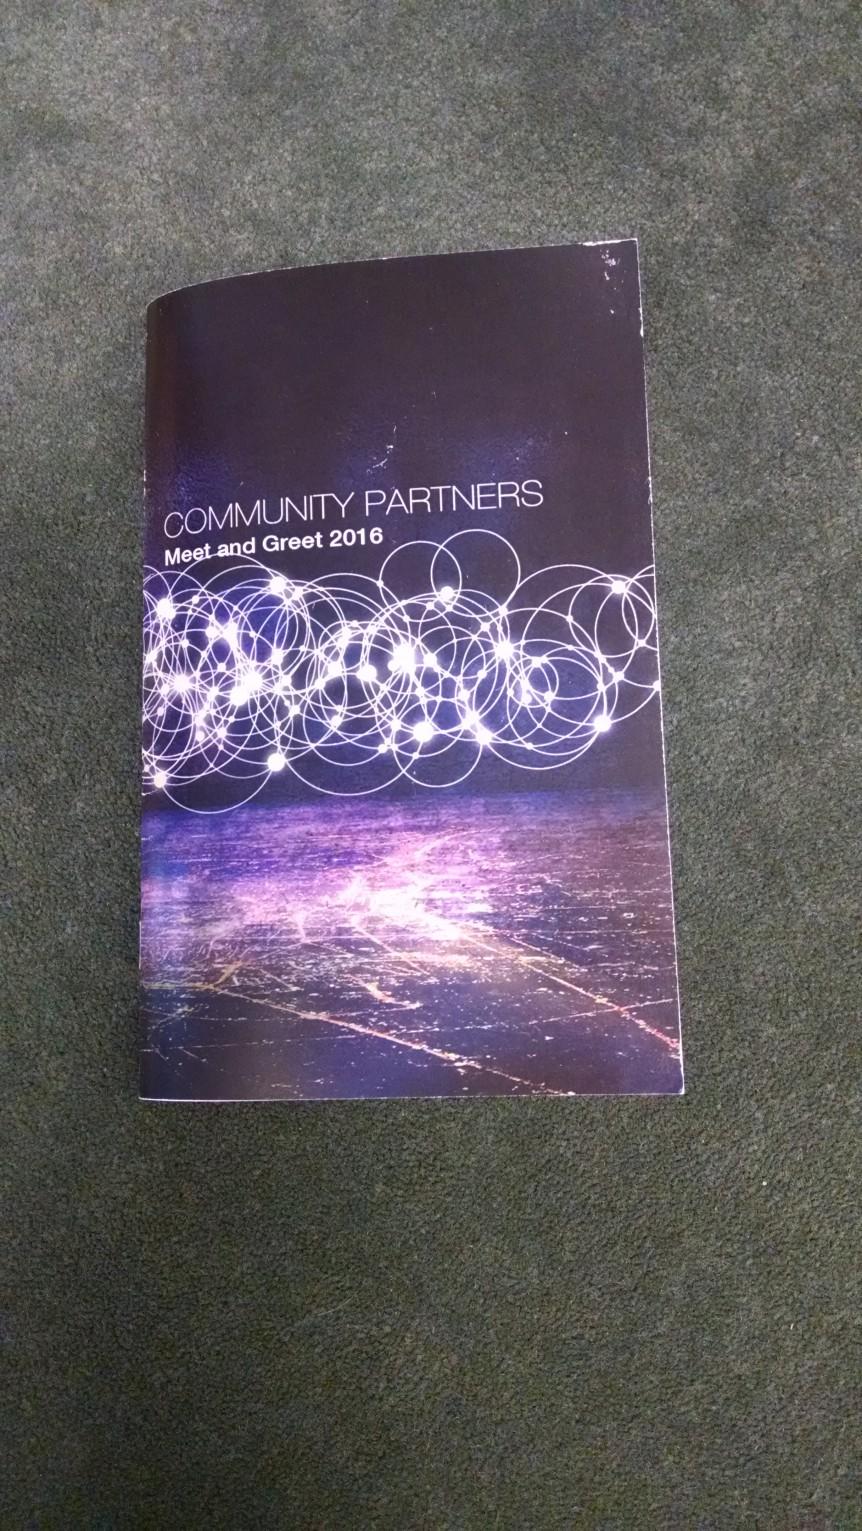 Community Partners Brochure